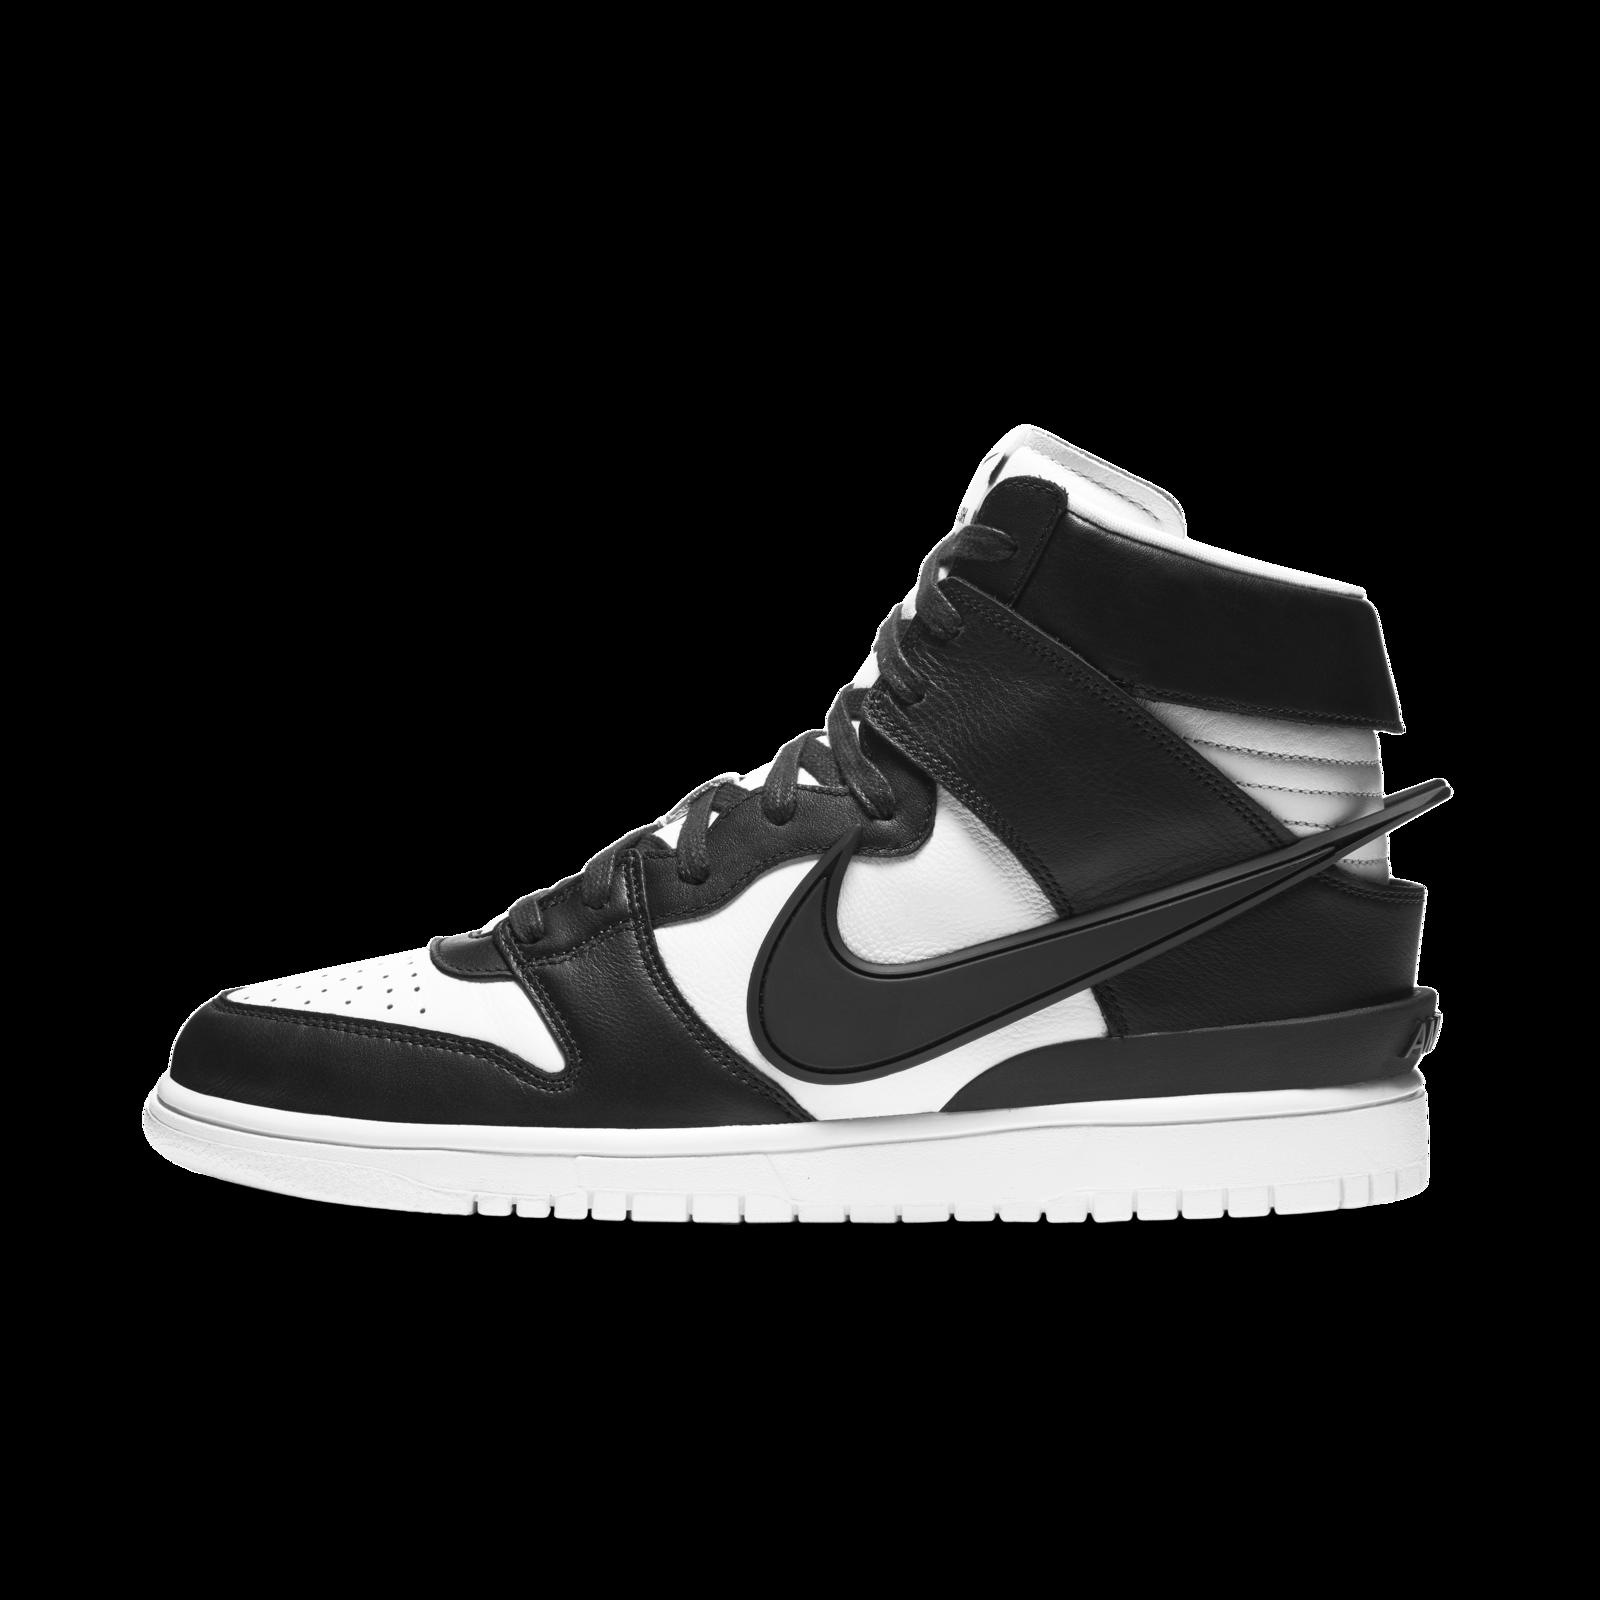 Nike x AMBUSH Dunk CU7544-001